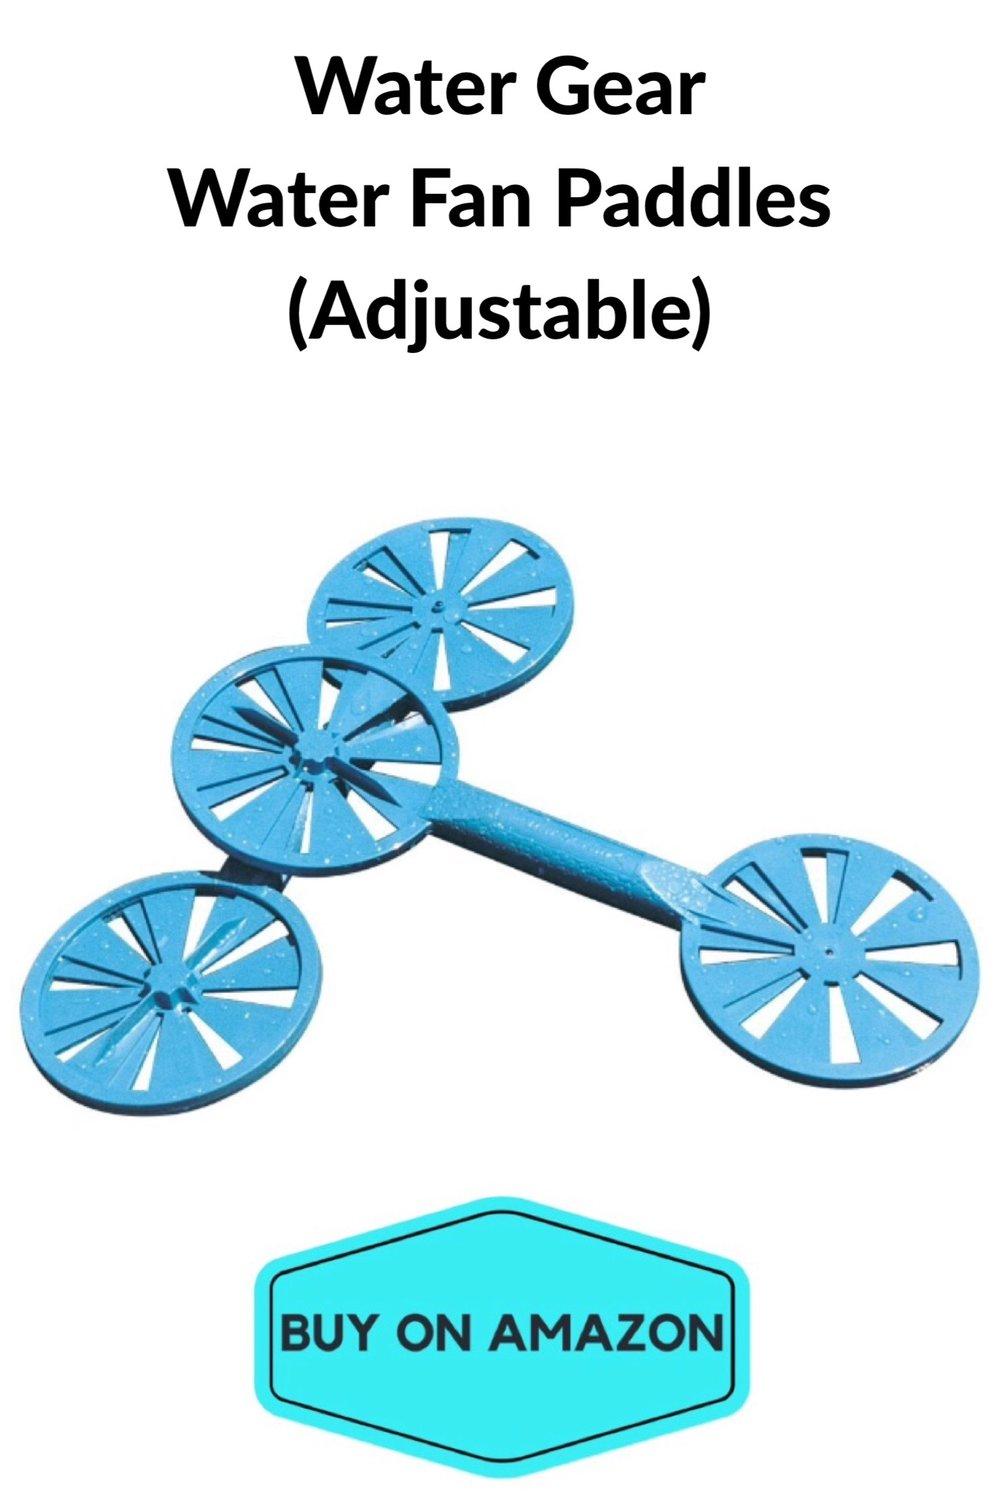 Water Fan Paddles, Adjustable